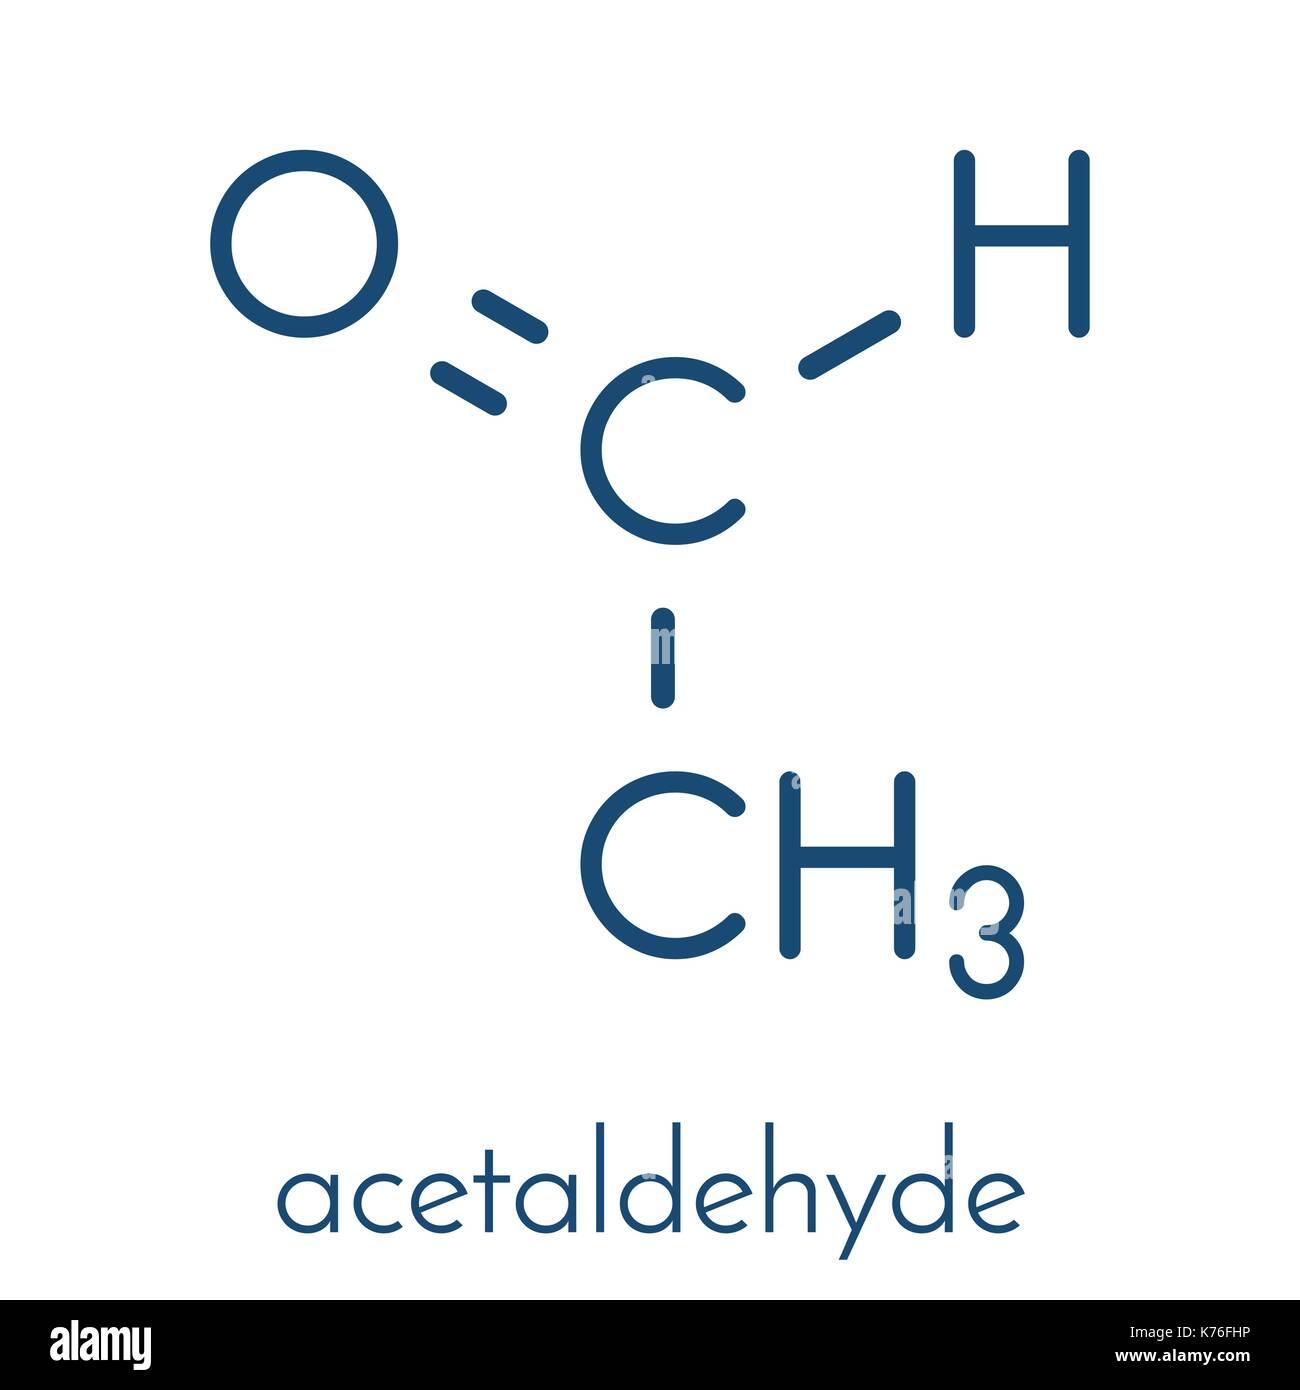 ethanol alcohol molecule flat icon stock photos  u0026 ethanol alcohol molecule flat icon stock